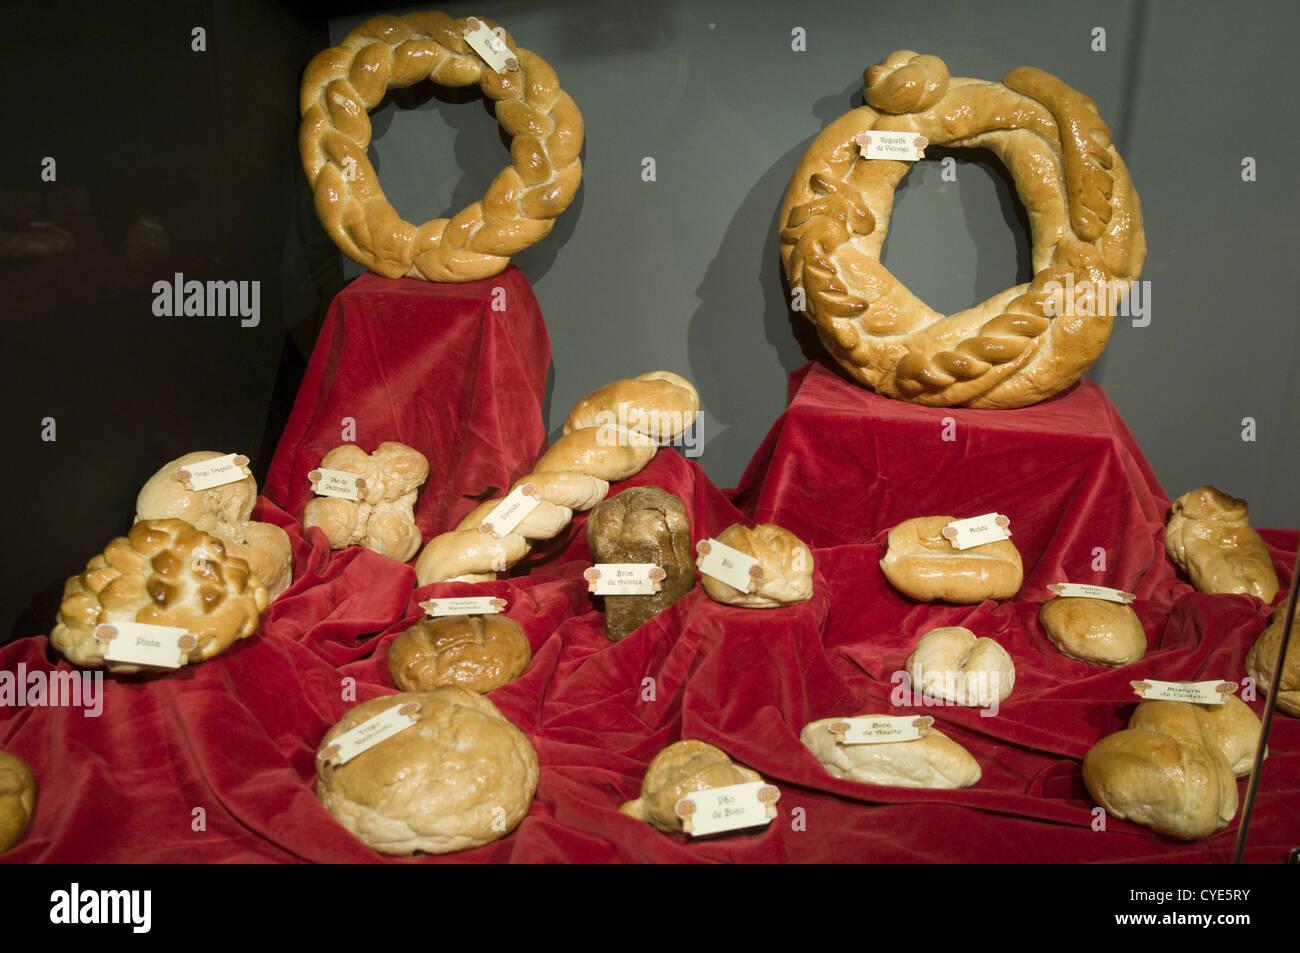 Bread Museum, in Seia, Portugal (Museu do Pão) - Stock Image